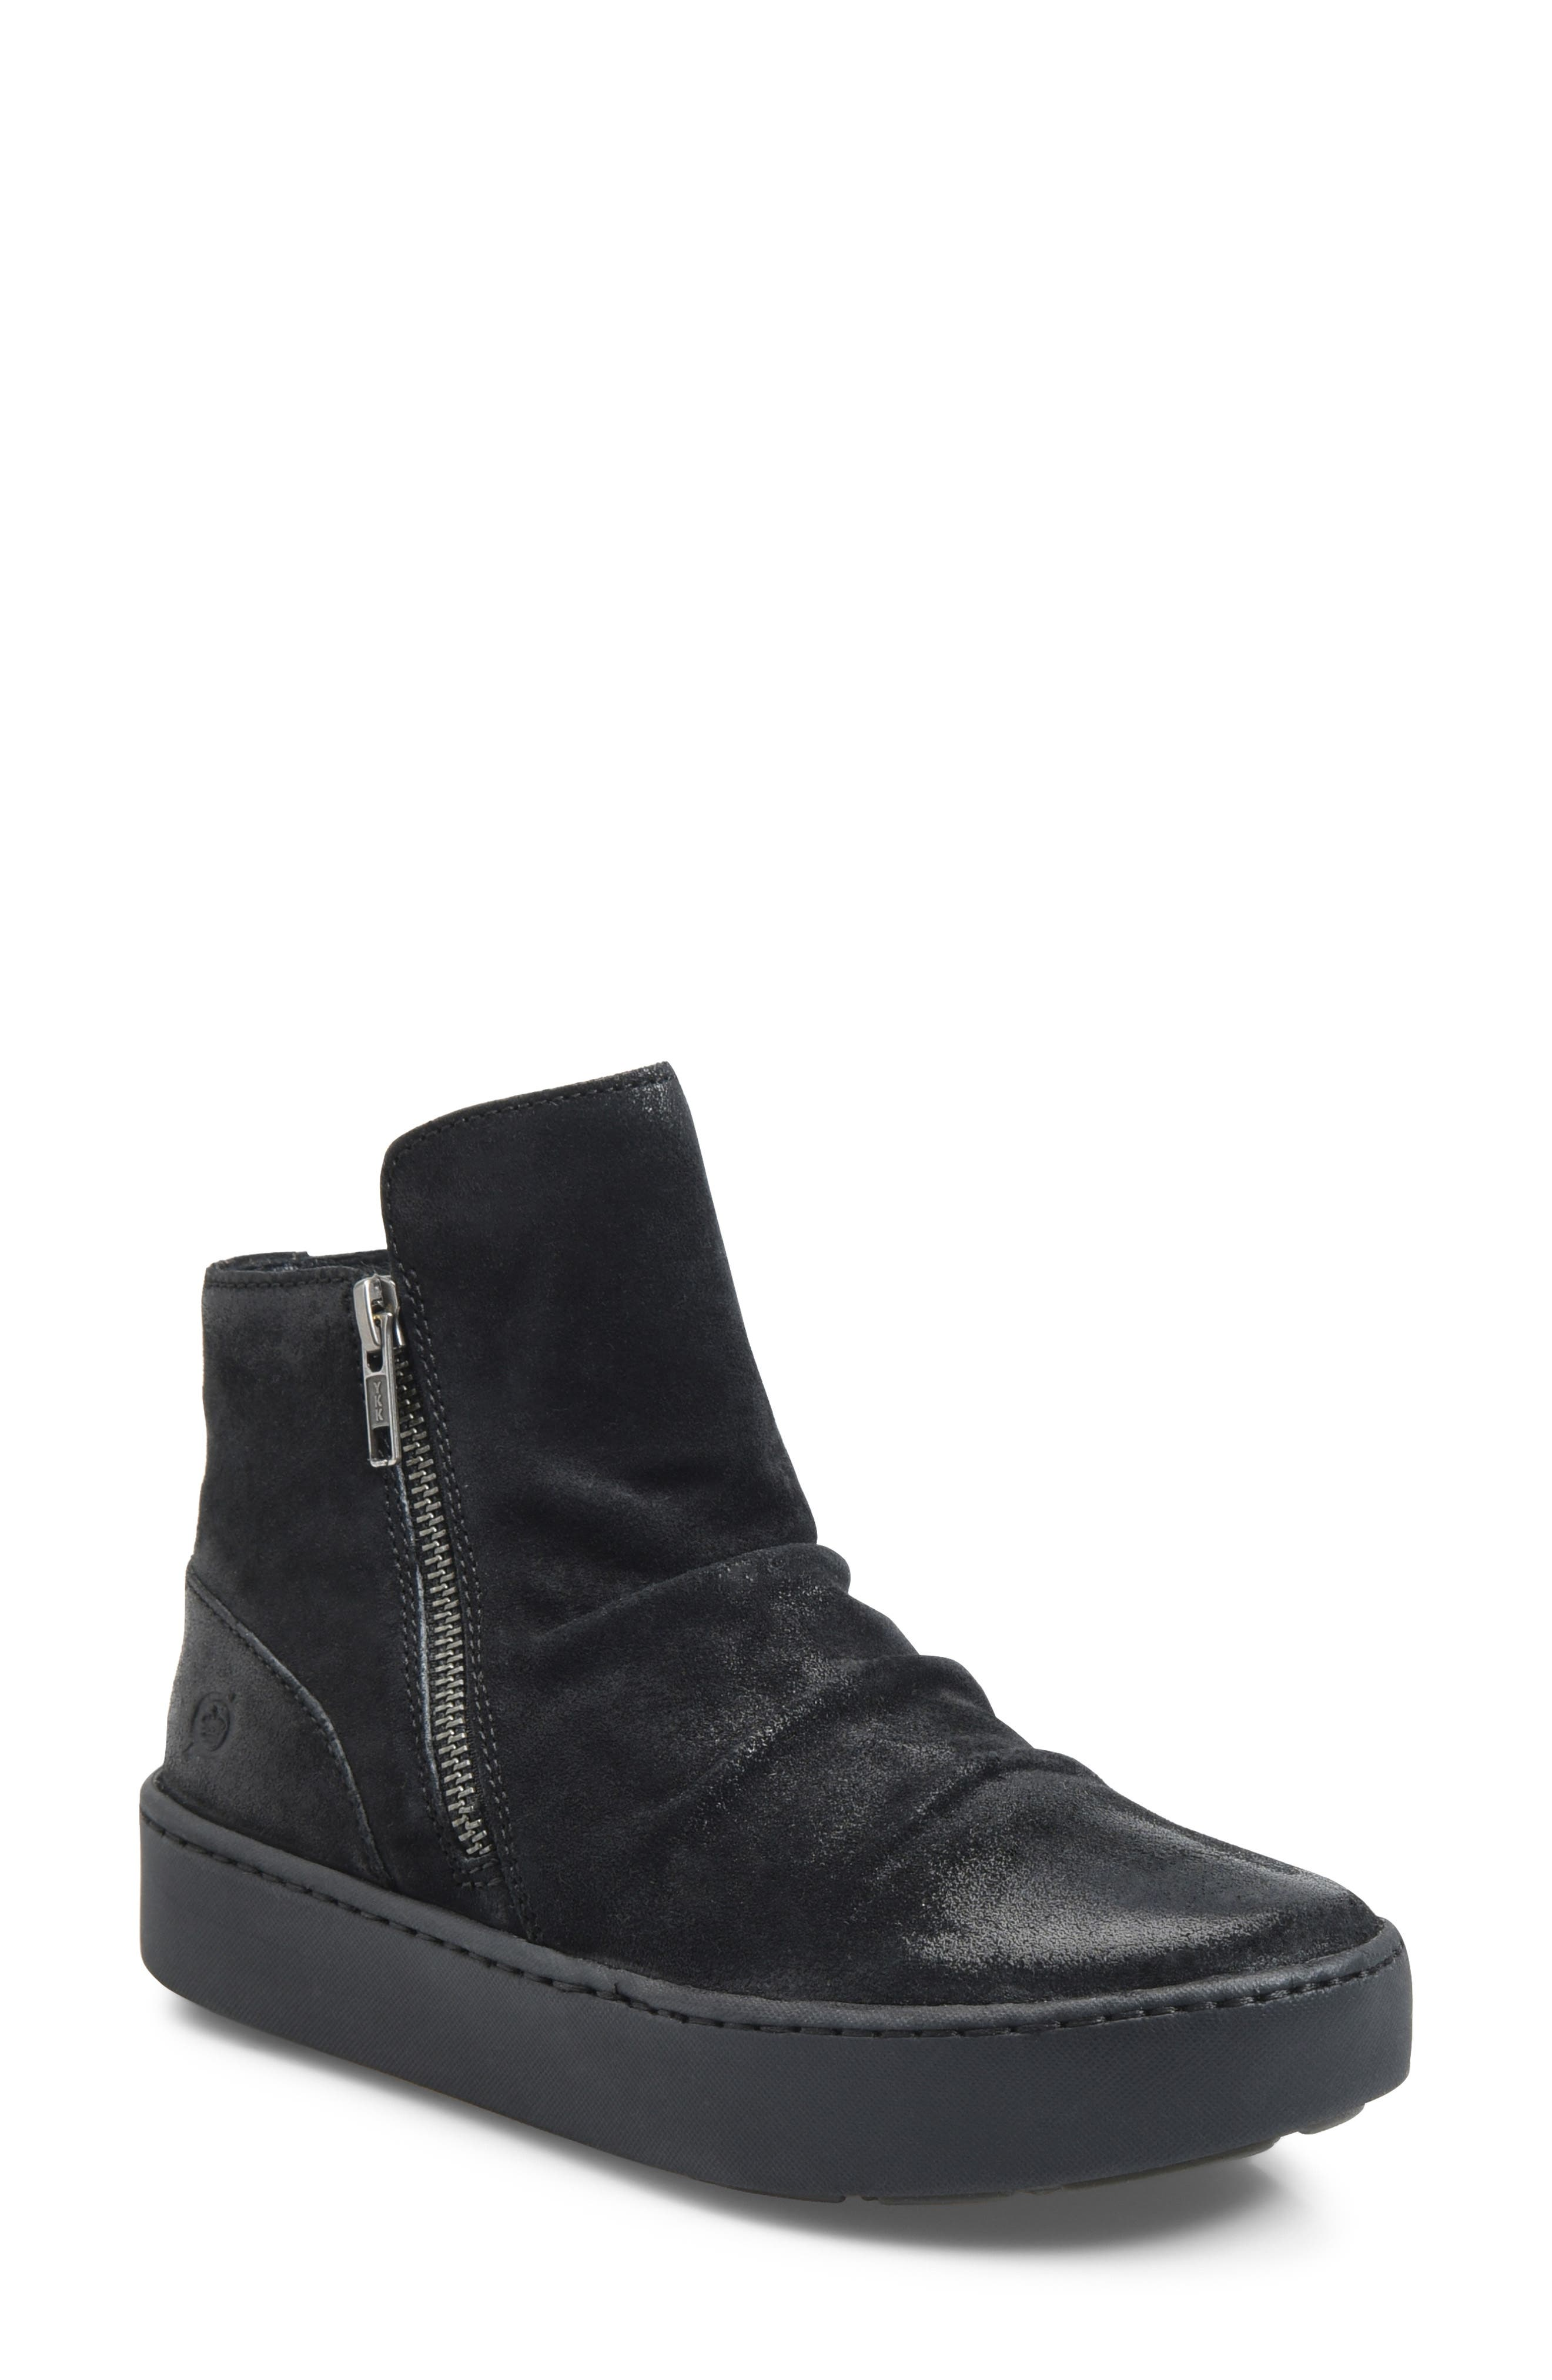 B?rn Scone Sneaker Boot, Black